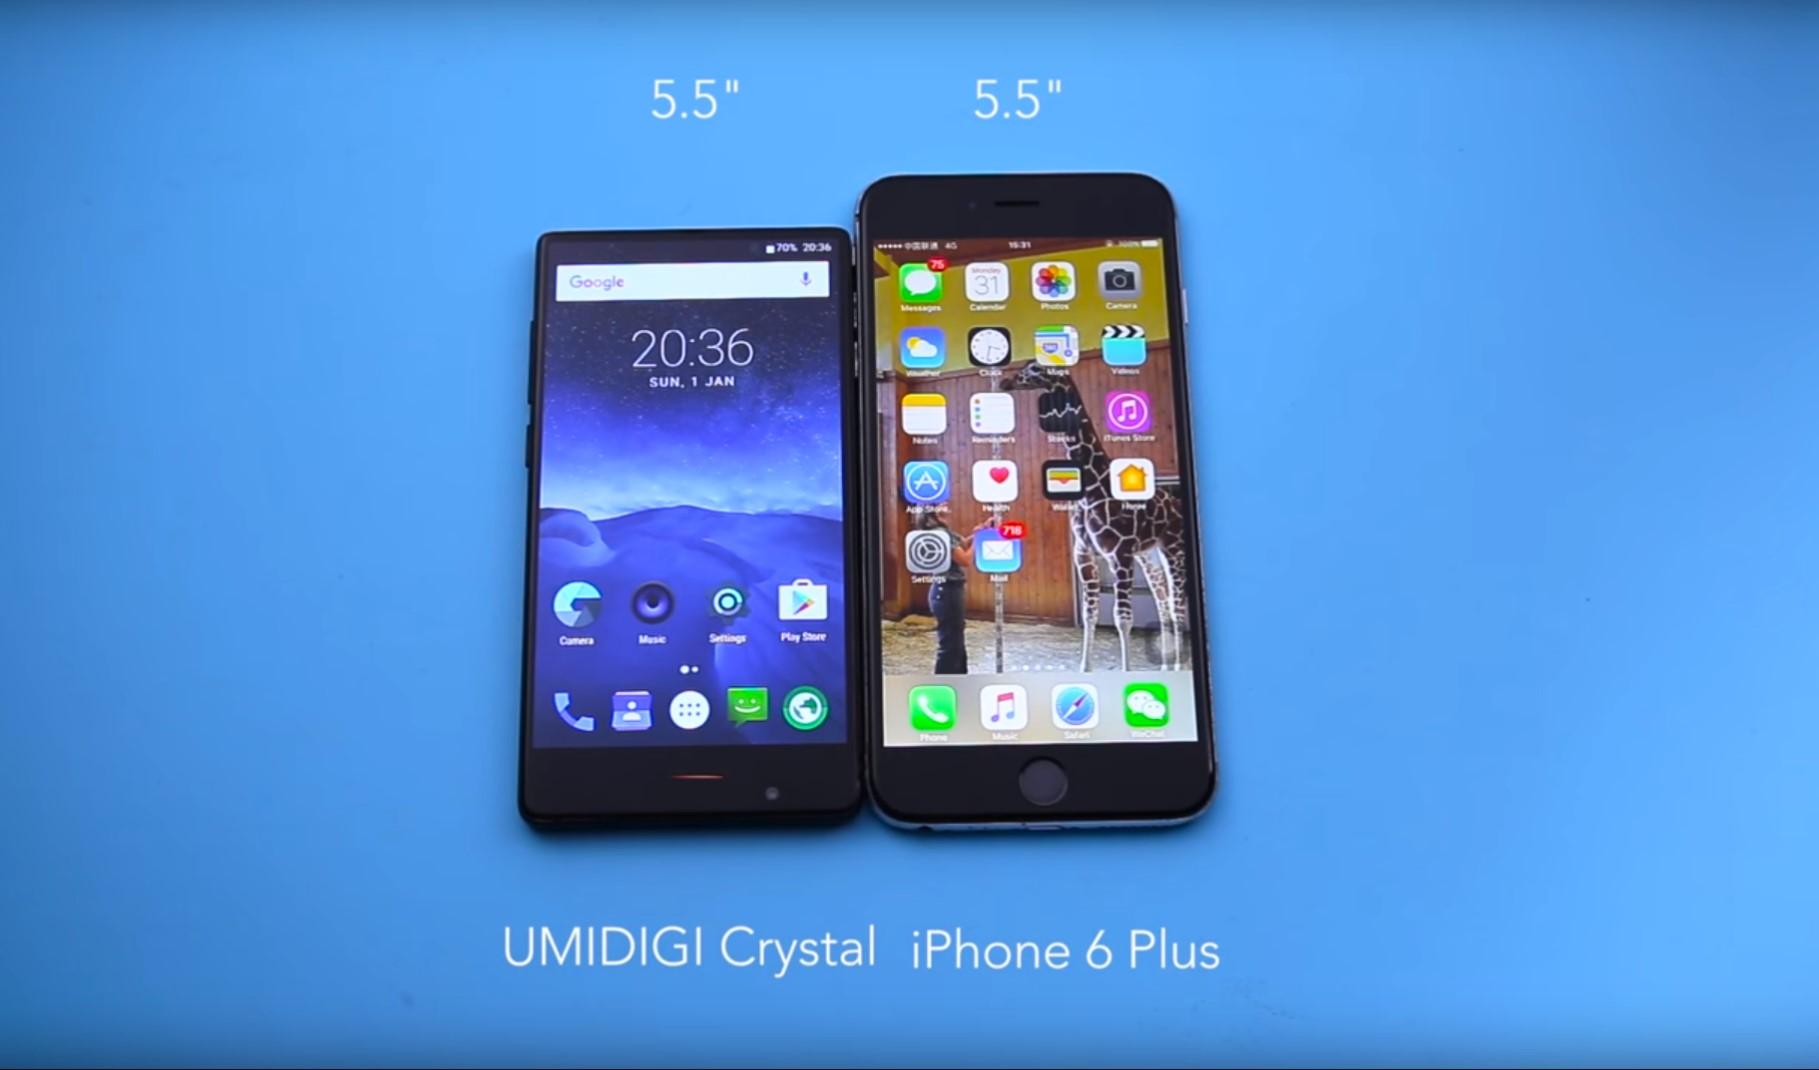 umidigi crystal le smartphone sans bord smartphone actualit. Black Bedroom Furniture Sets. Home Design Ideas